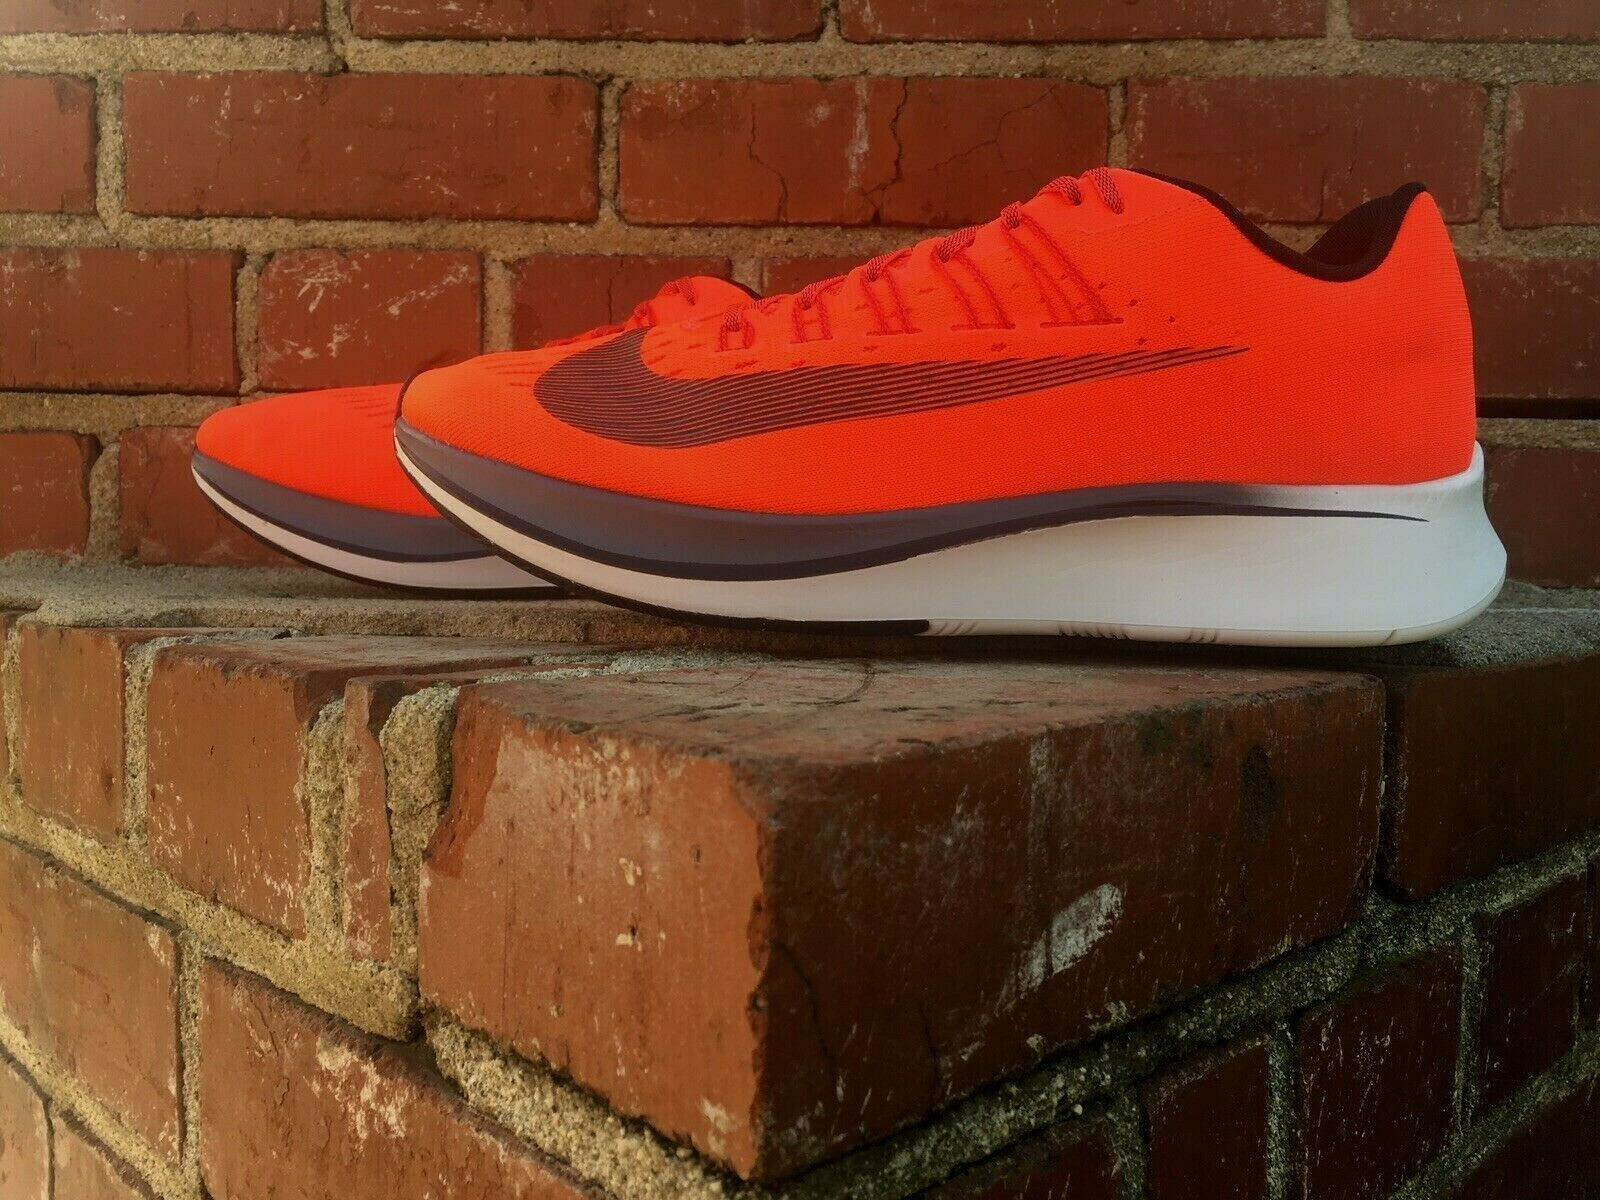 on sale f21b8 02e7d Nike Zoom Fly Bright Crimson Running Turnschuhe schuhe schuhe schuhe Style 880848  614 Men Größe 12 9e8b5a